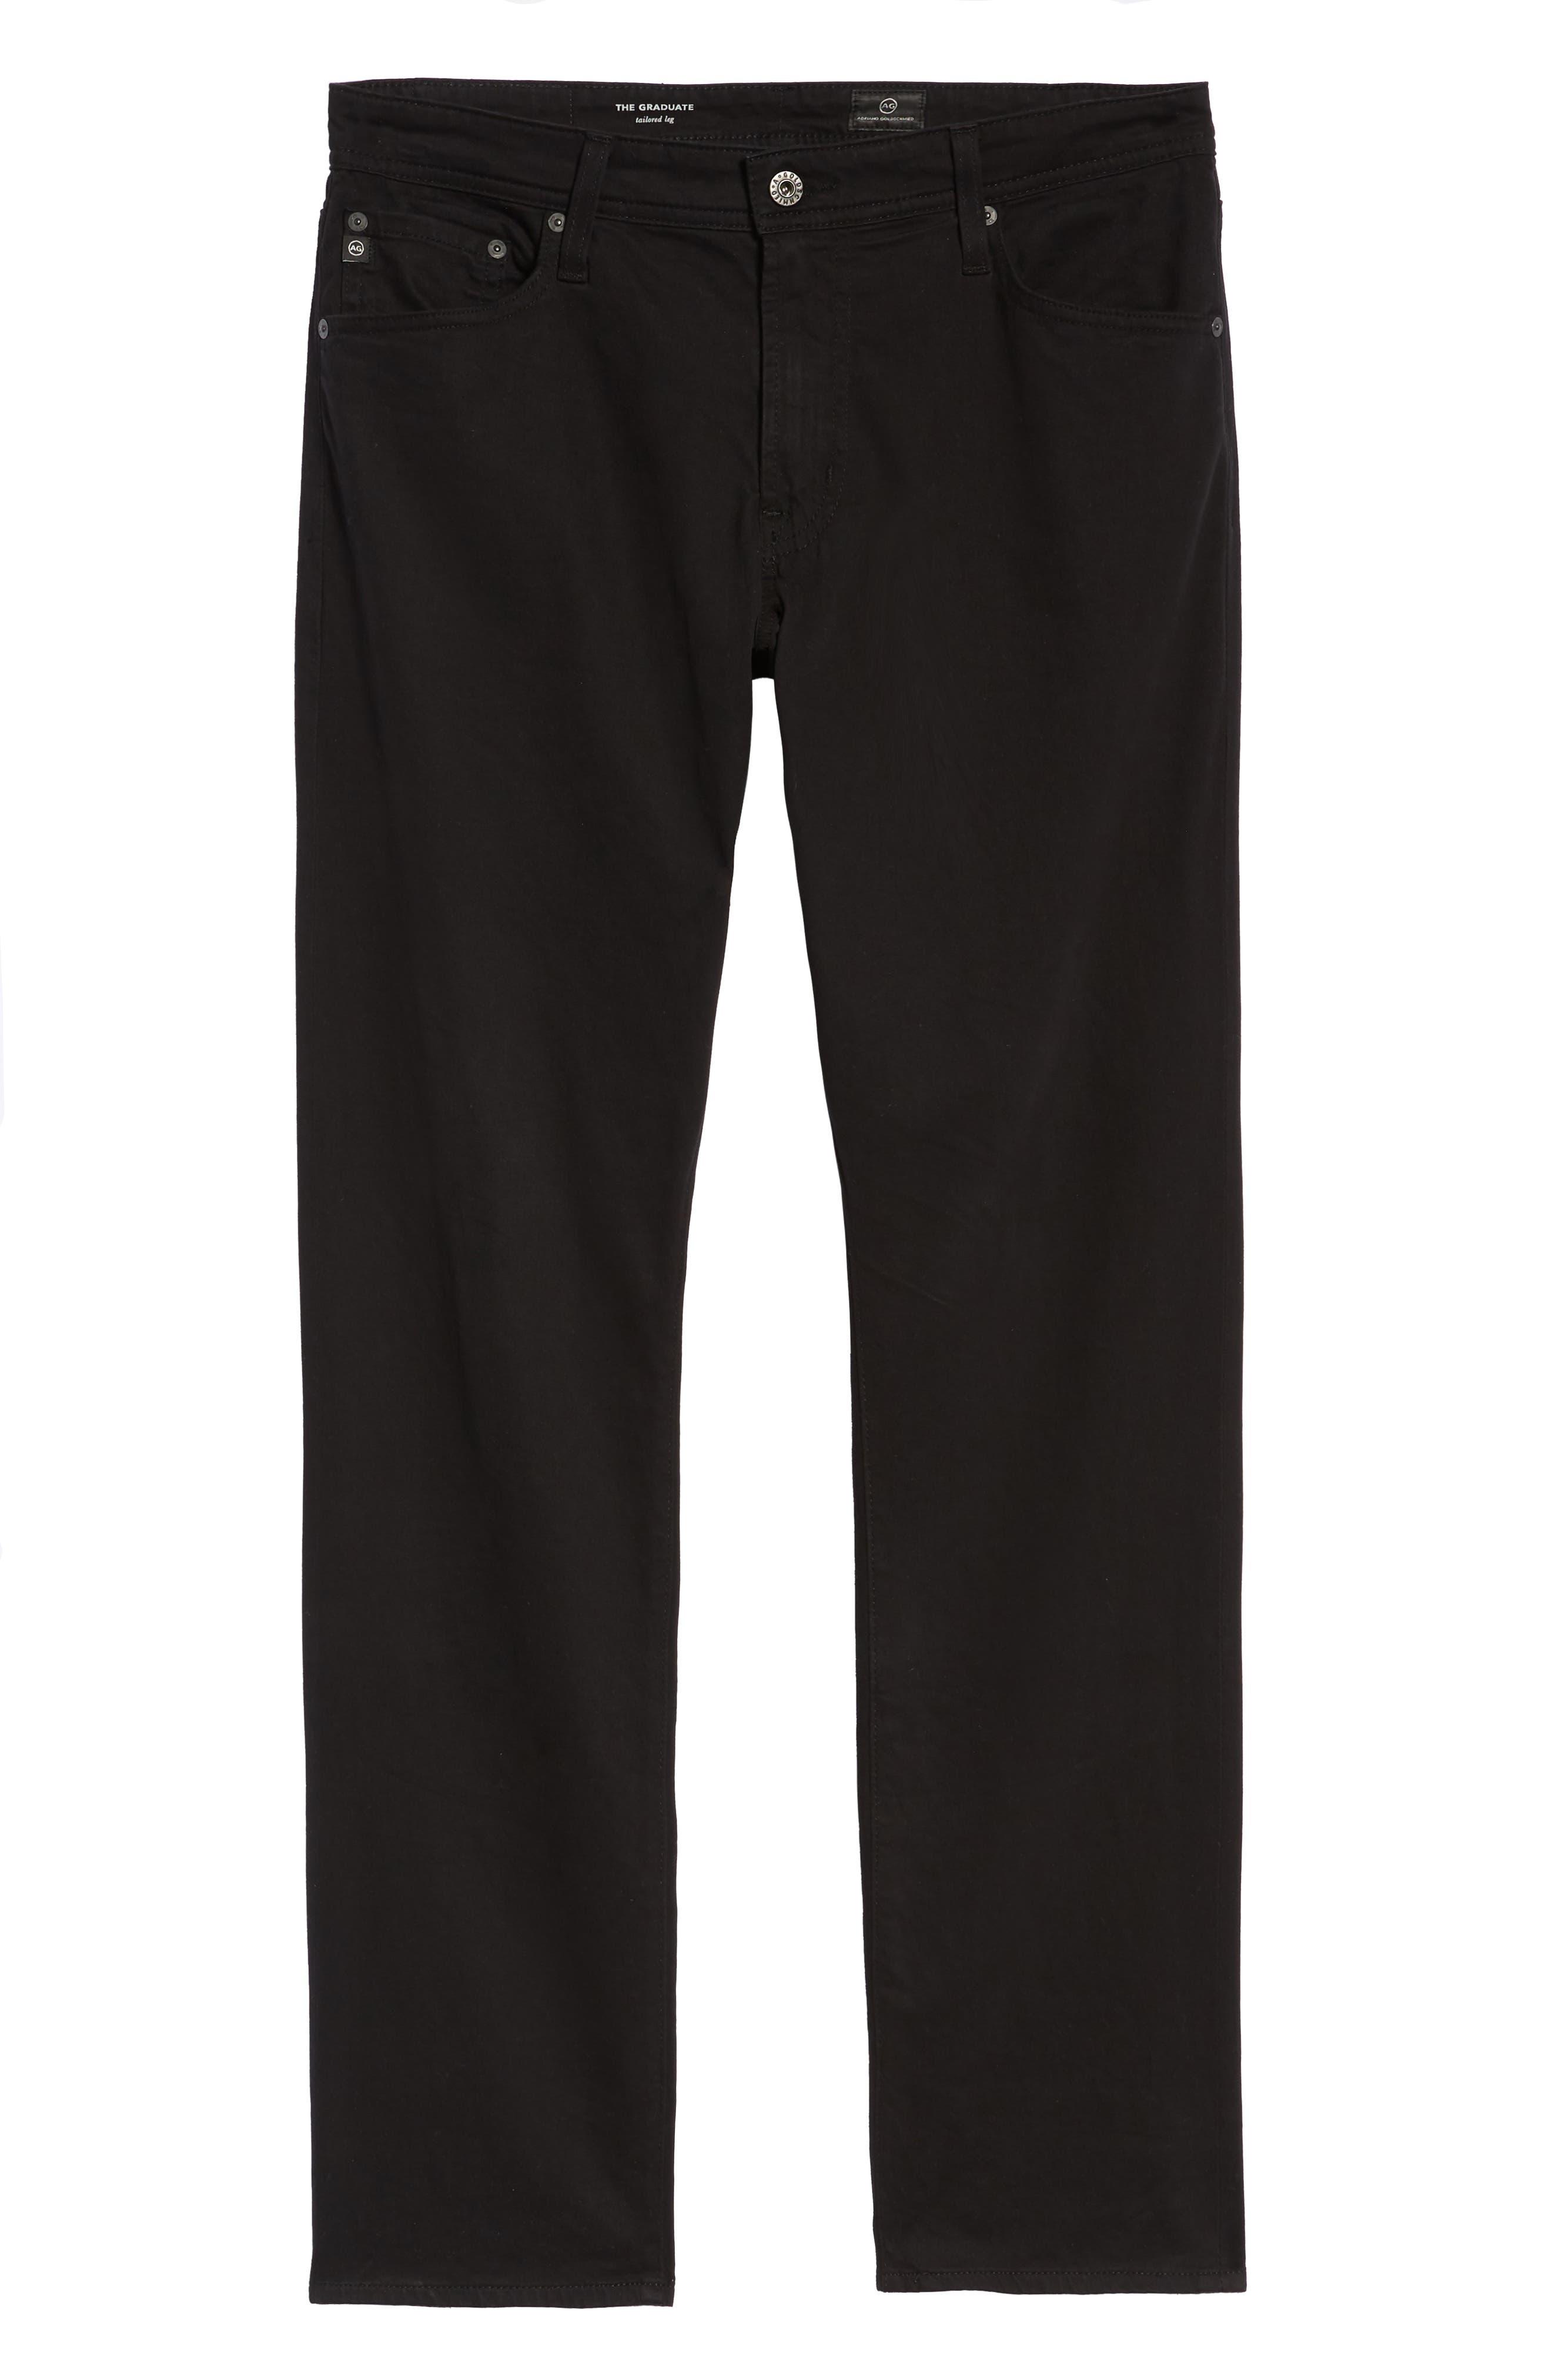 Graduate SUD Slim Straight Leg Pants,                             Alternate thumbnail 7, color,                             010